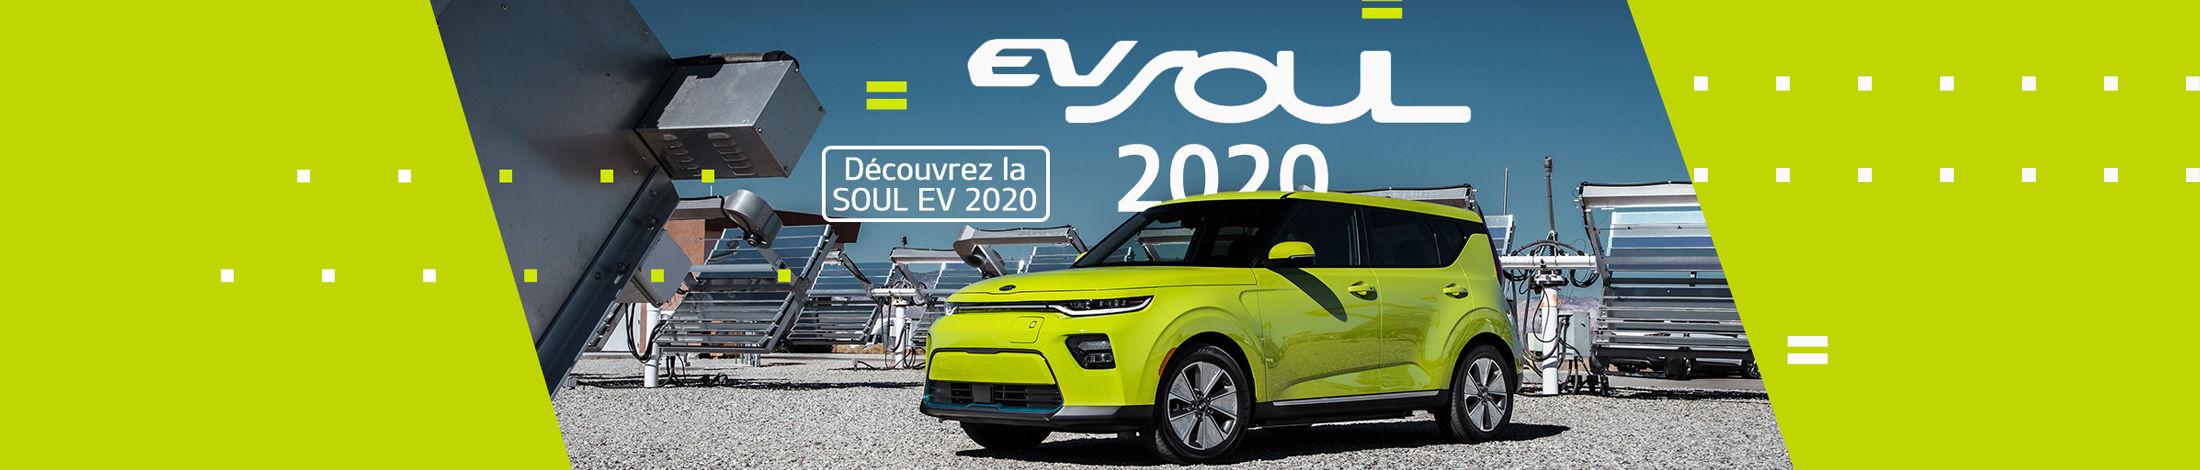 Soul EV 2020 Kia (Copie)